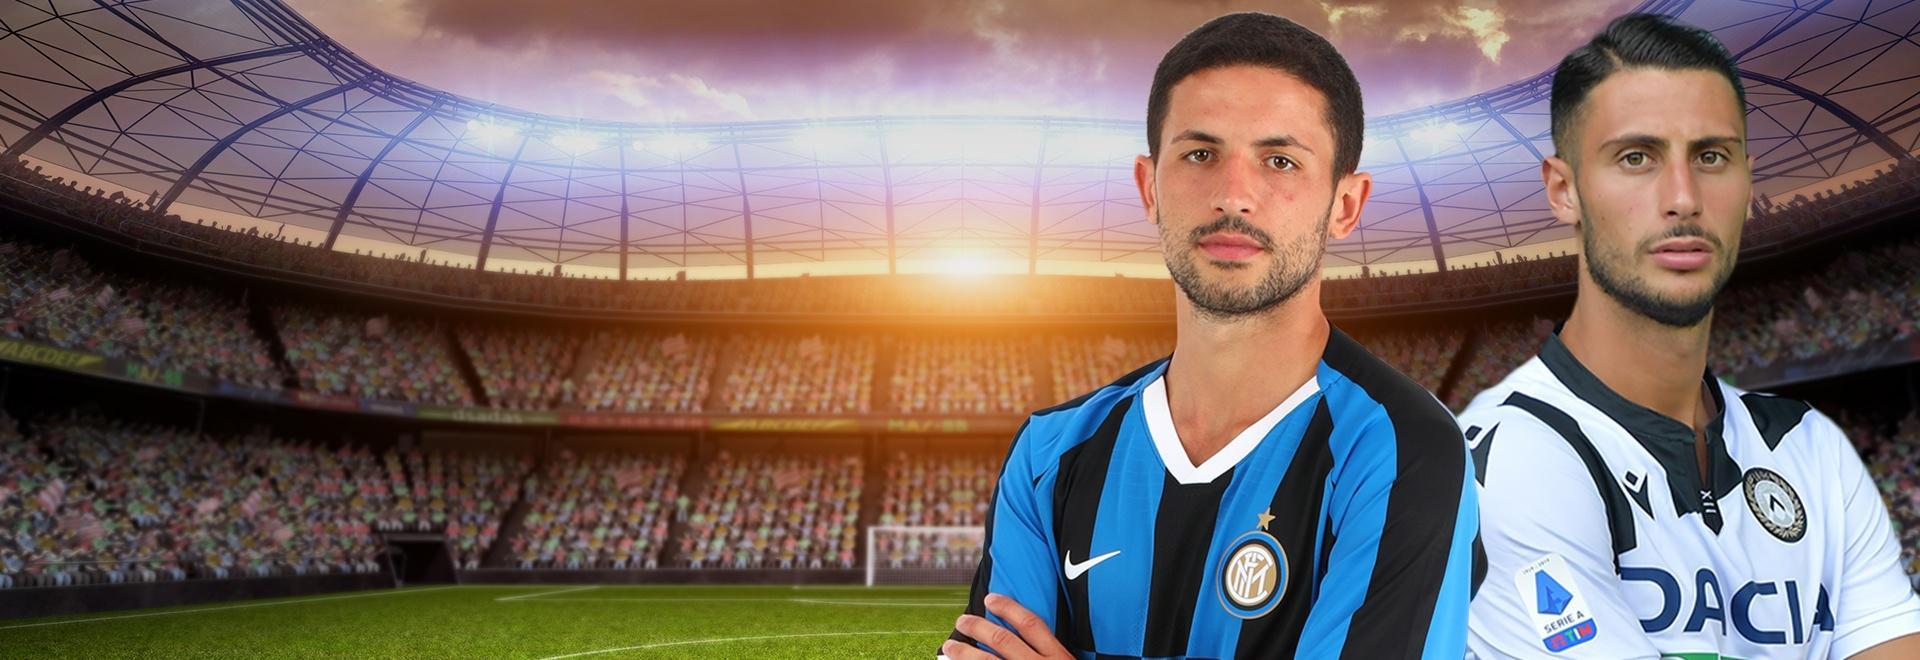 Inter - Udinese